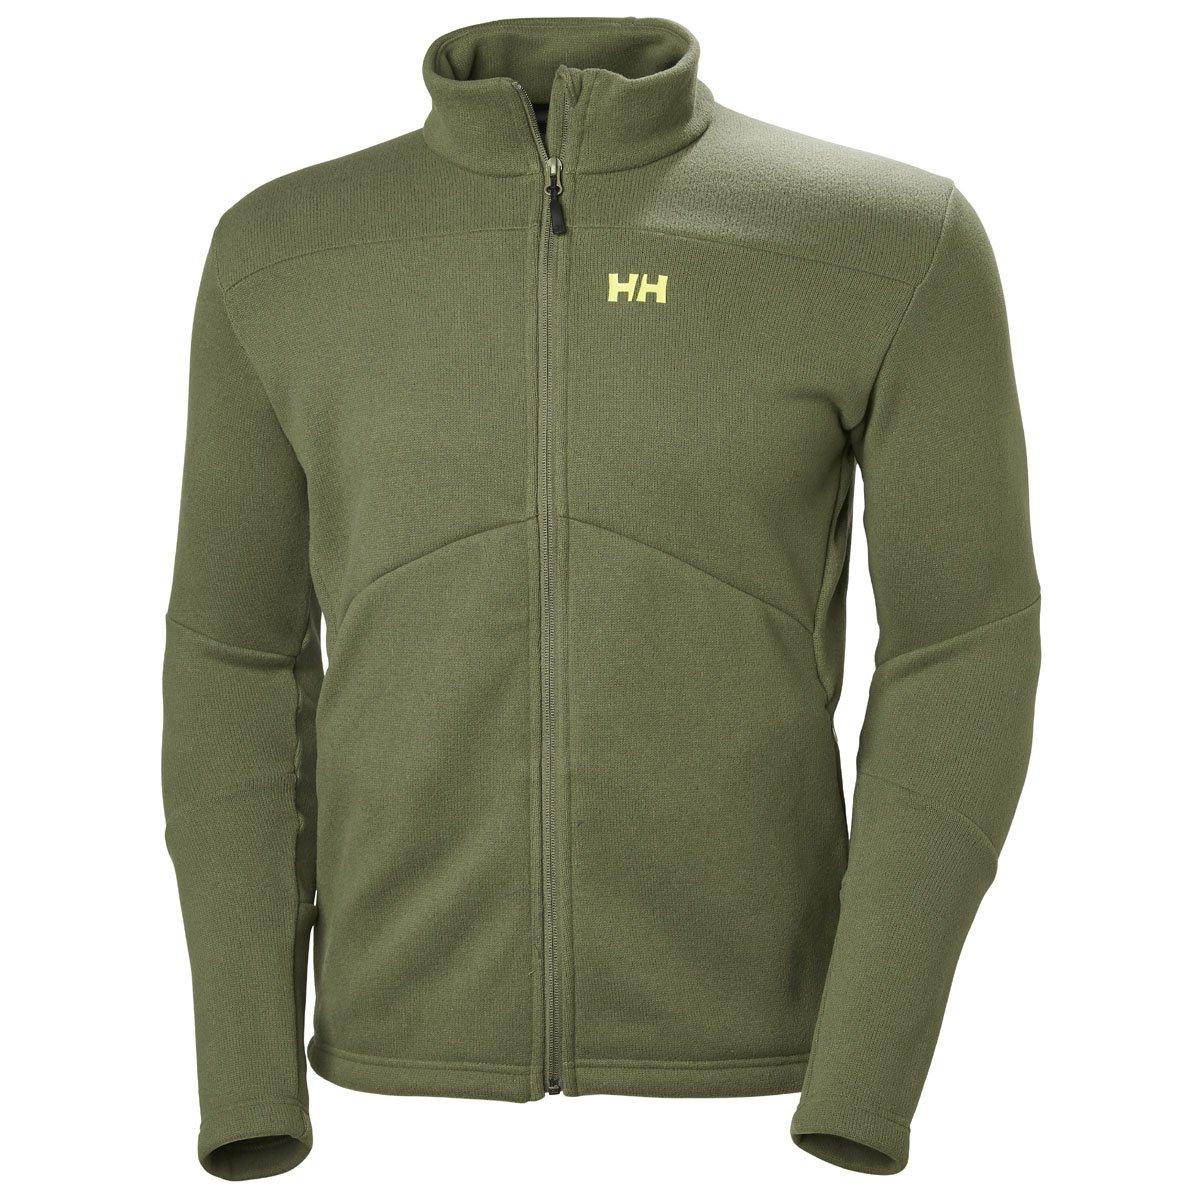 Helly Hansen Eq Black Midlayer Jacket